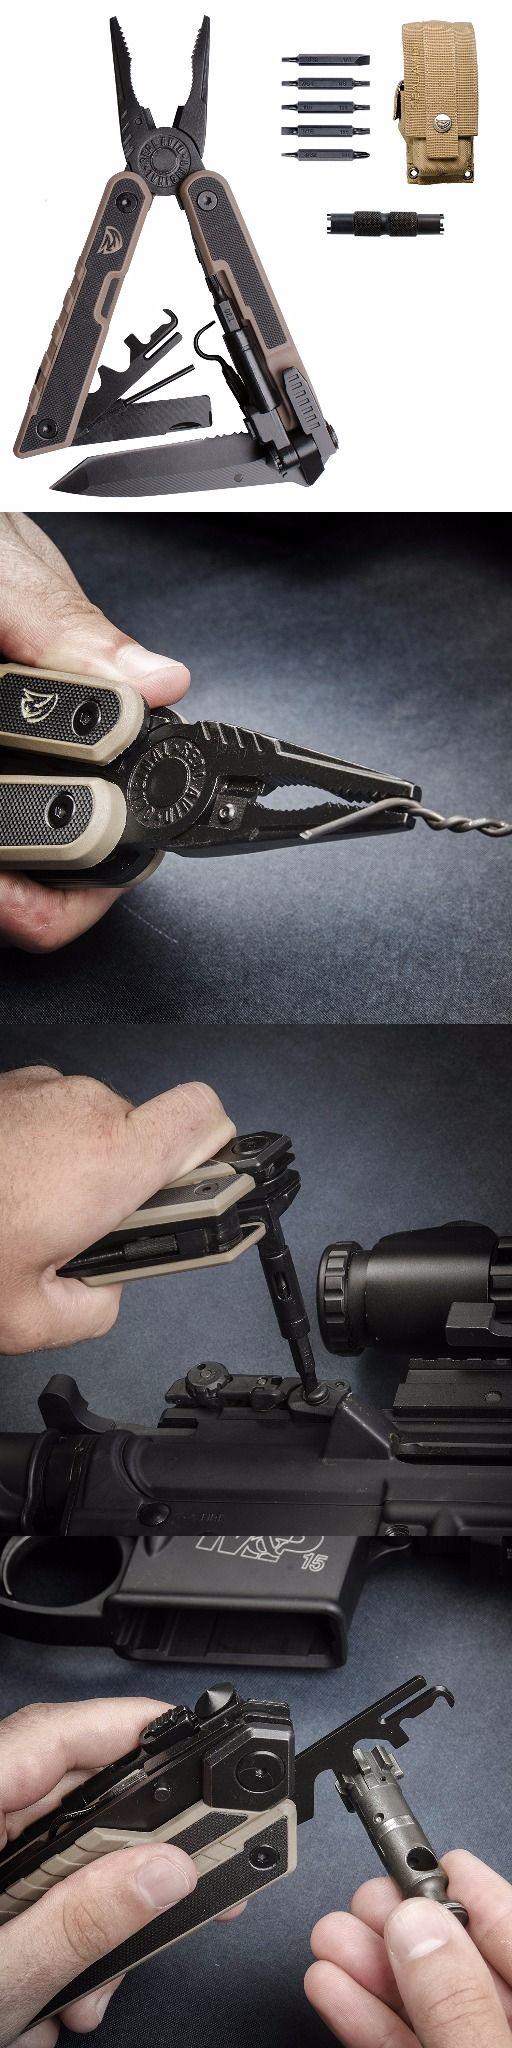 Real Avid AR15 Gun Tool EDC Everyday Carry Multi Tool For Rifle Maintenance @thistookmymoney